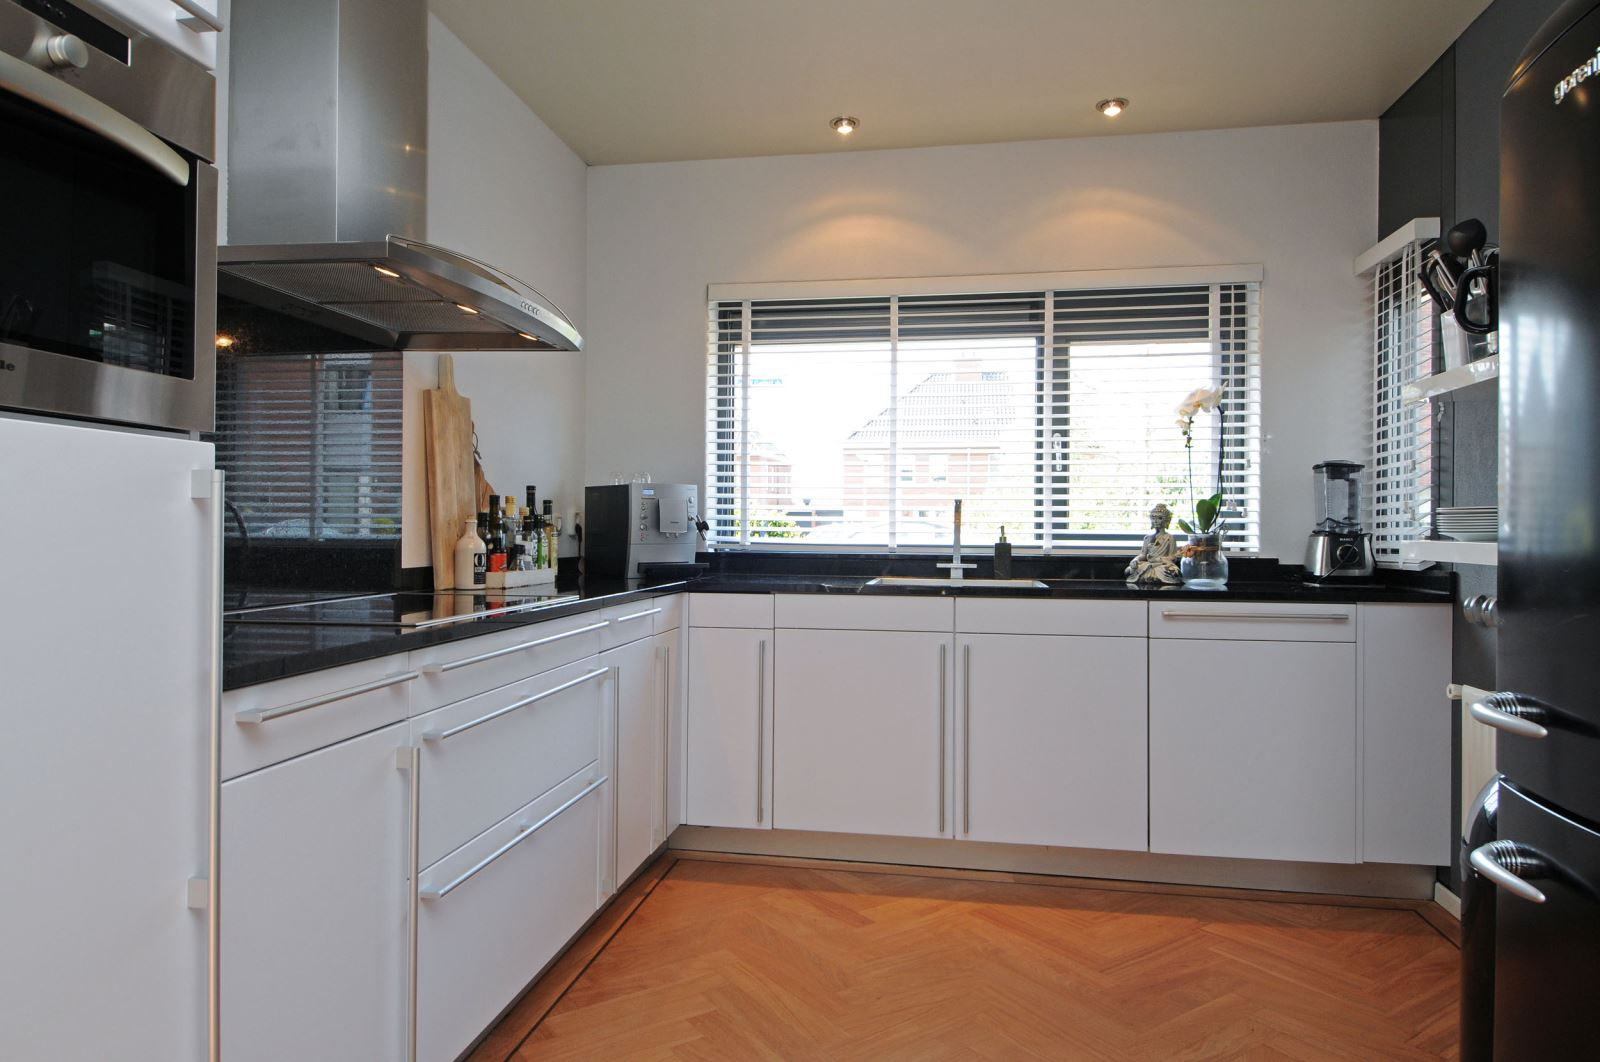 keuken foto 7